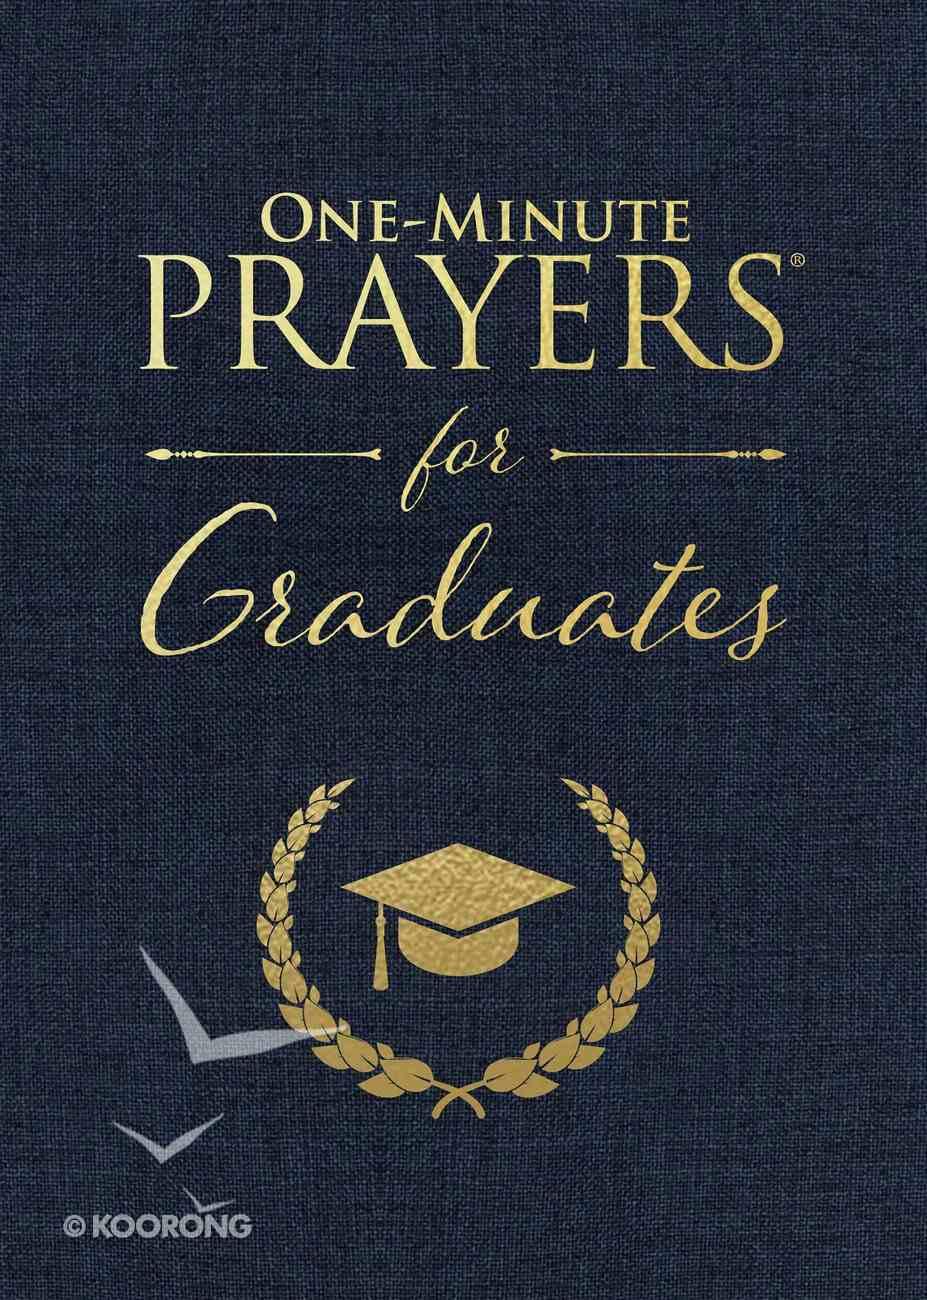 One-Minute Prayers For Graduates eBook